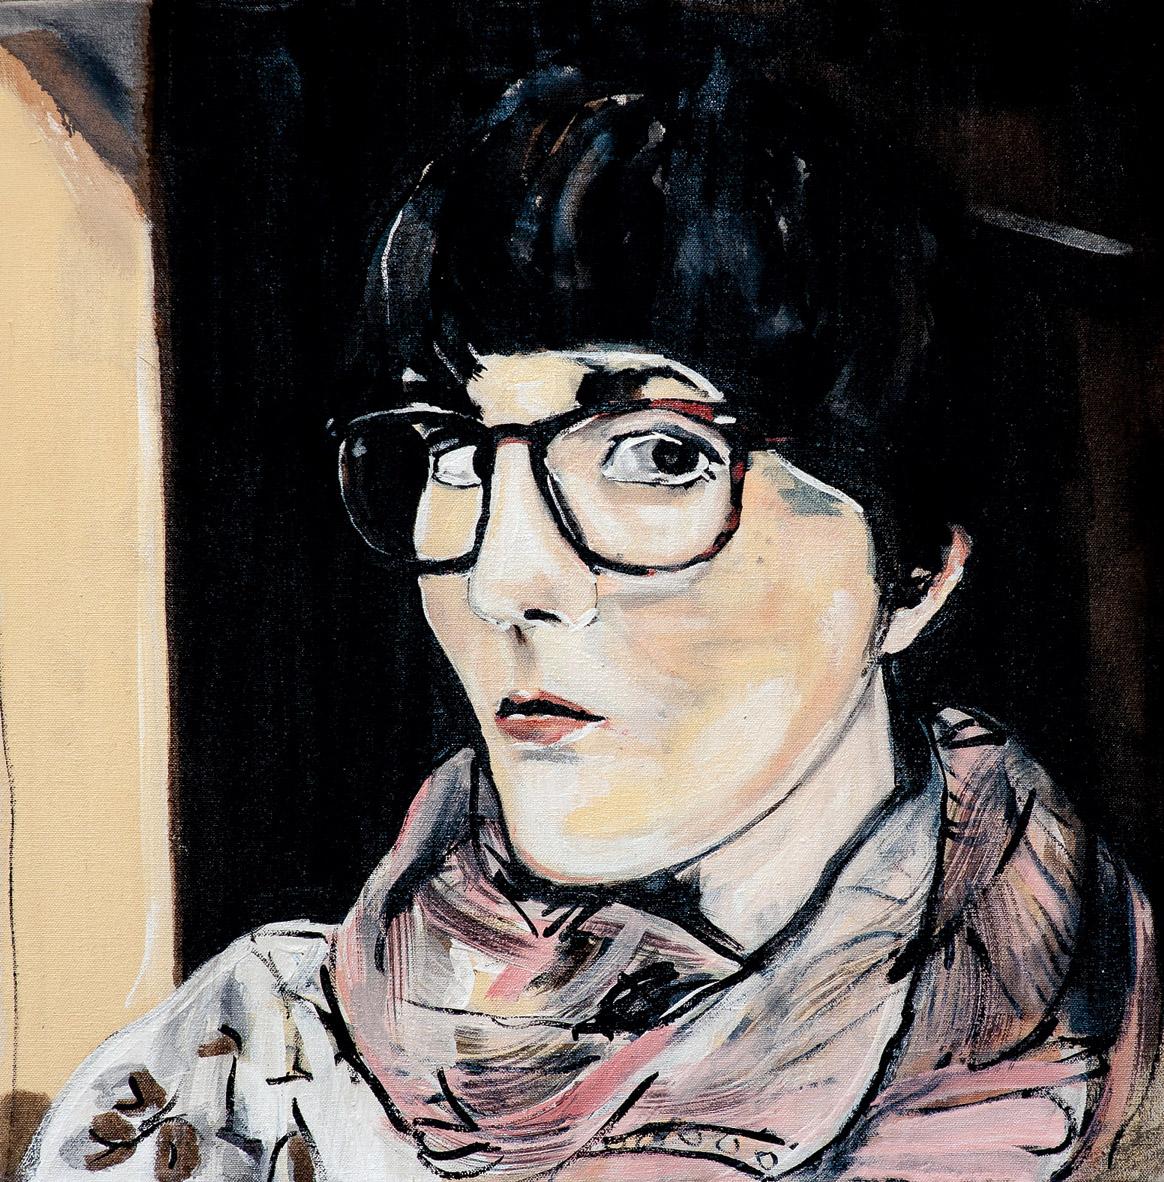 Painting of Kate Hargreaves by Melanie Janisse-Barlow